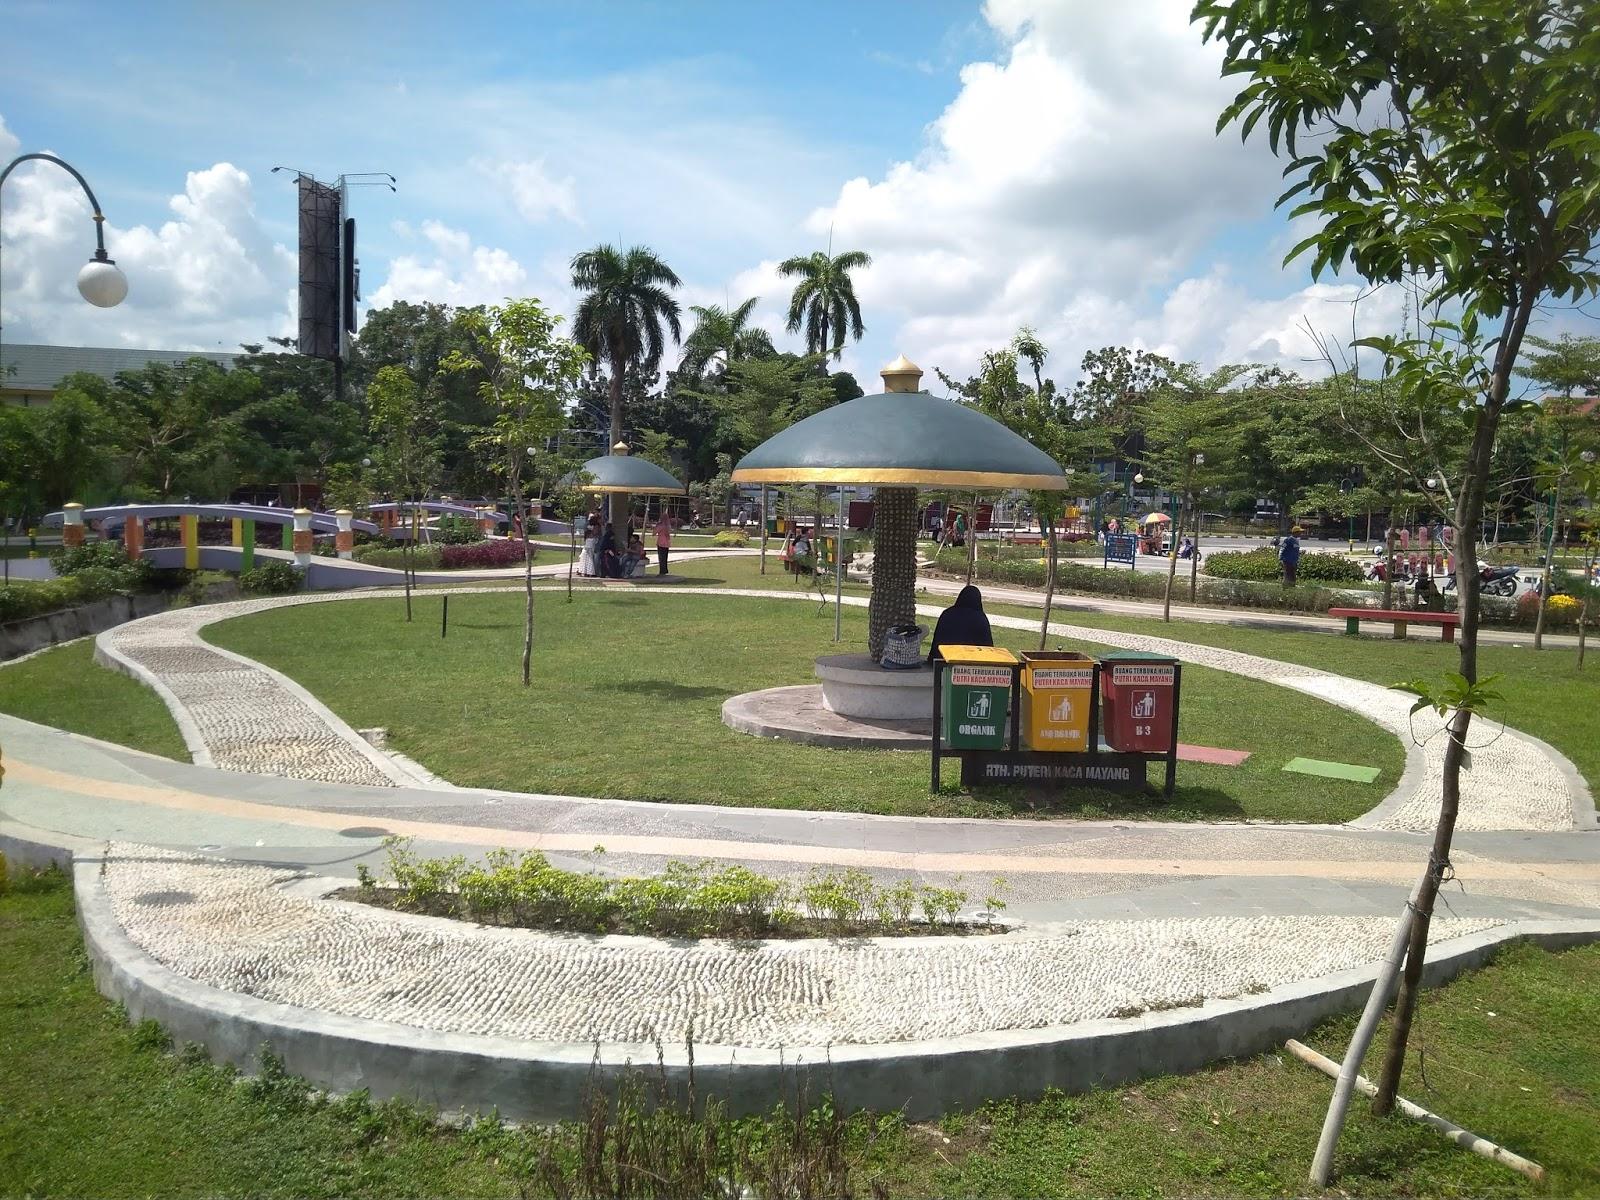 Nuansa Indah Taman Rth Putri Kaca Mayang Sudirman Pekanbaru Dilintasi